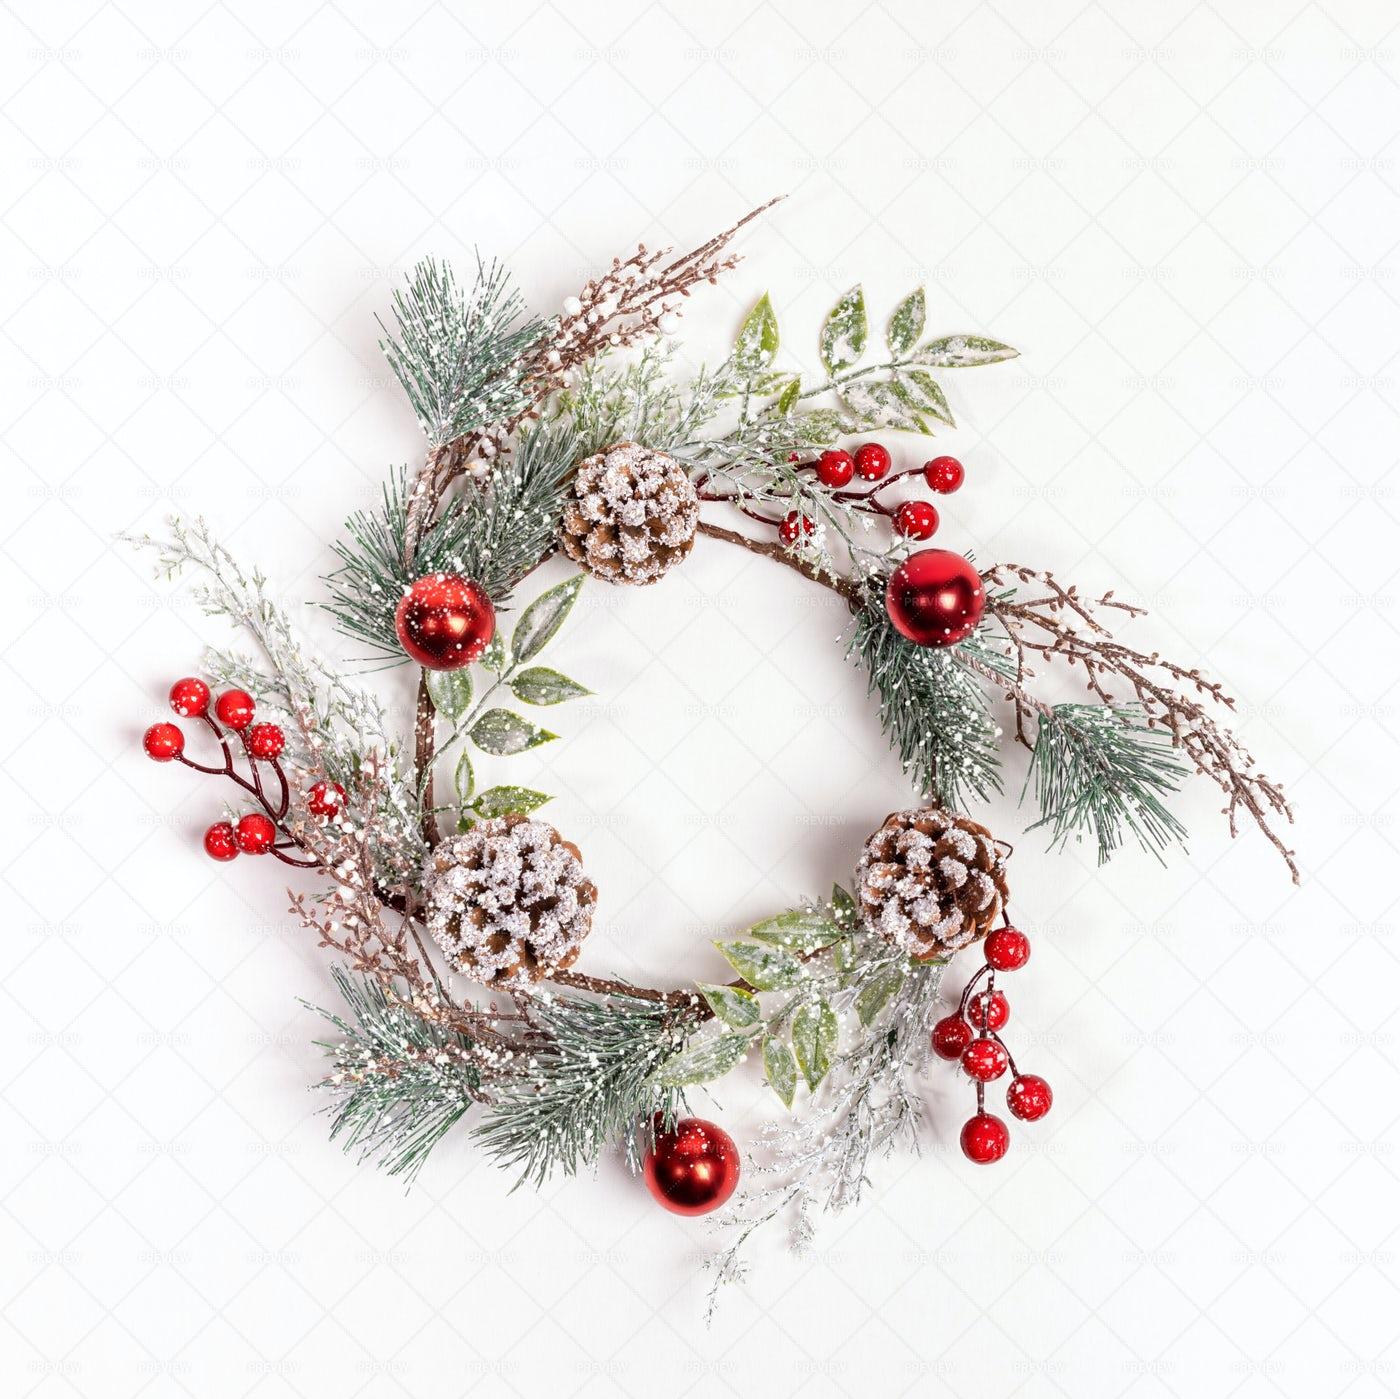 Handmade Reusable Christmas Wreath: Stock Photos